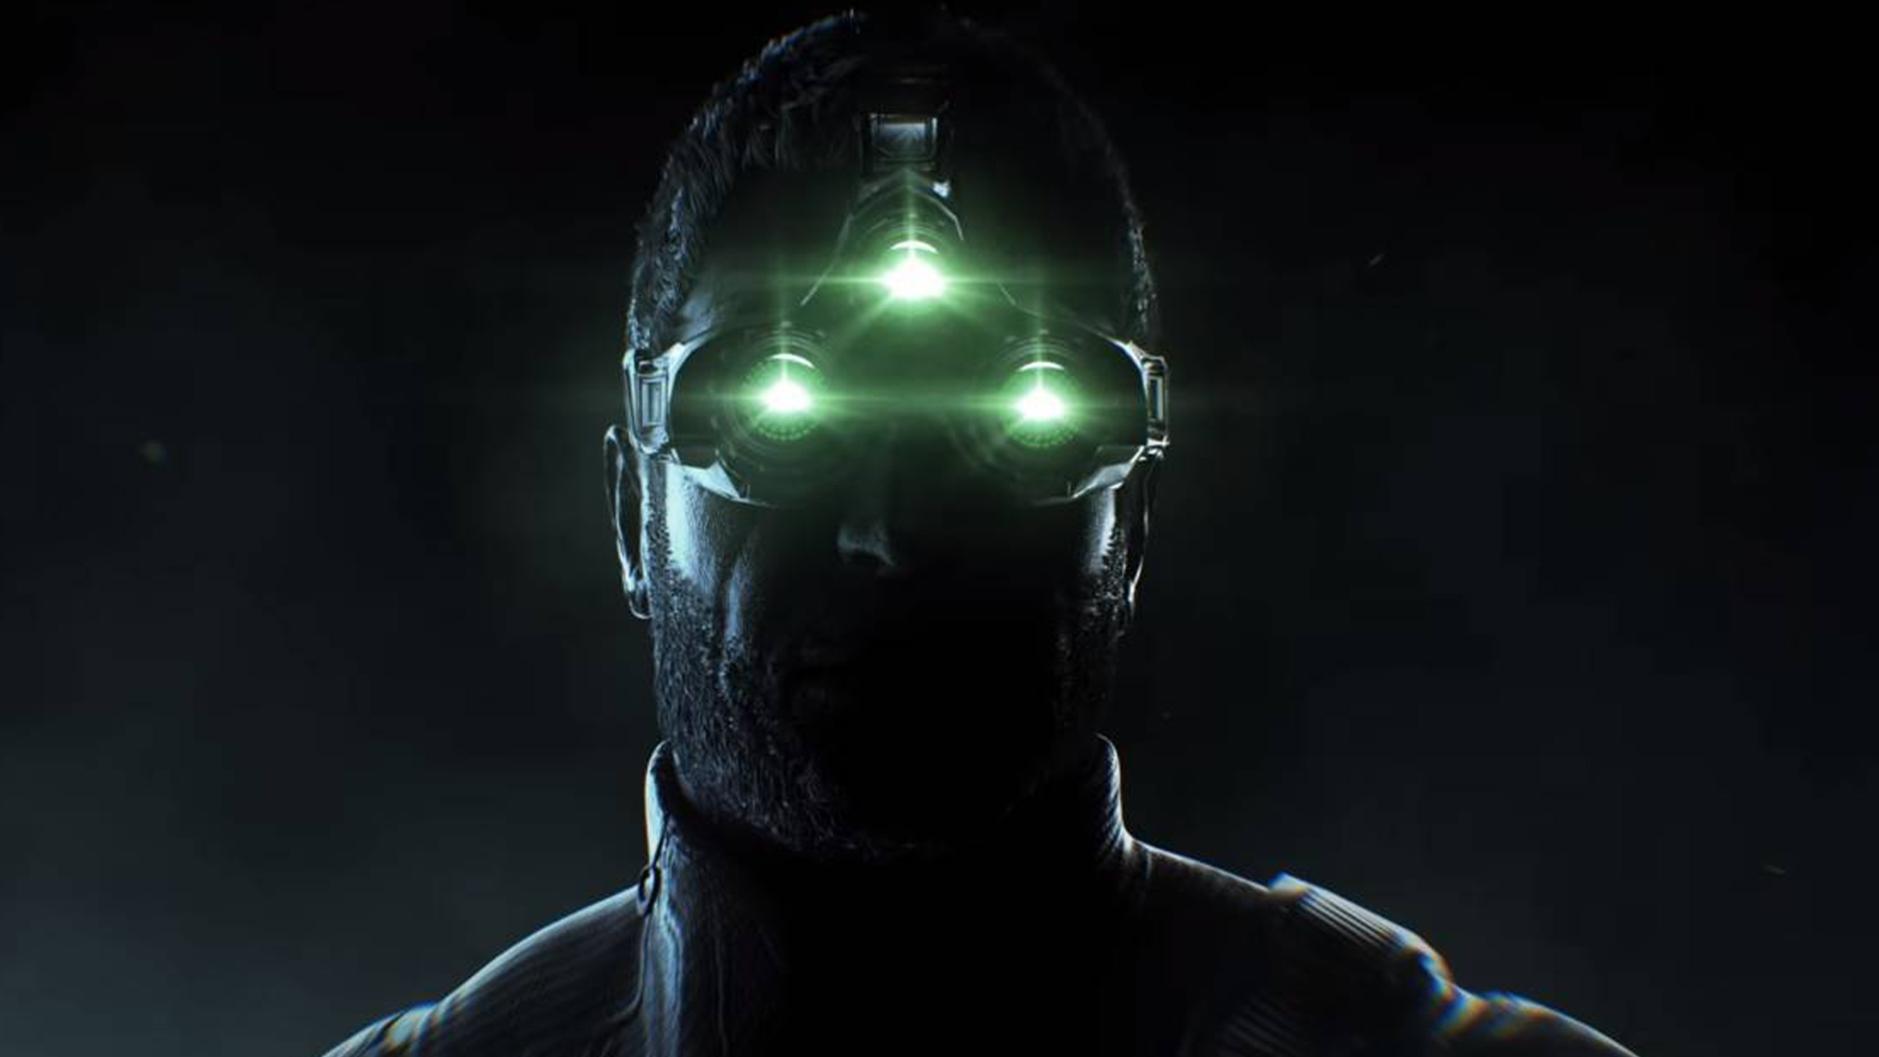 A new Splinter Cell is no laughing matter